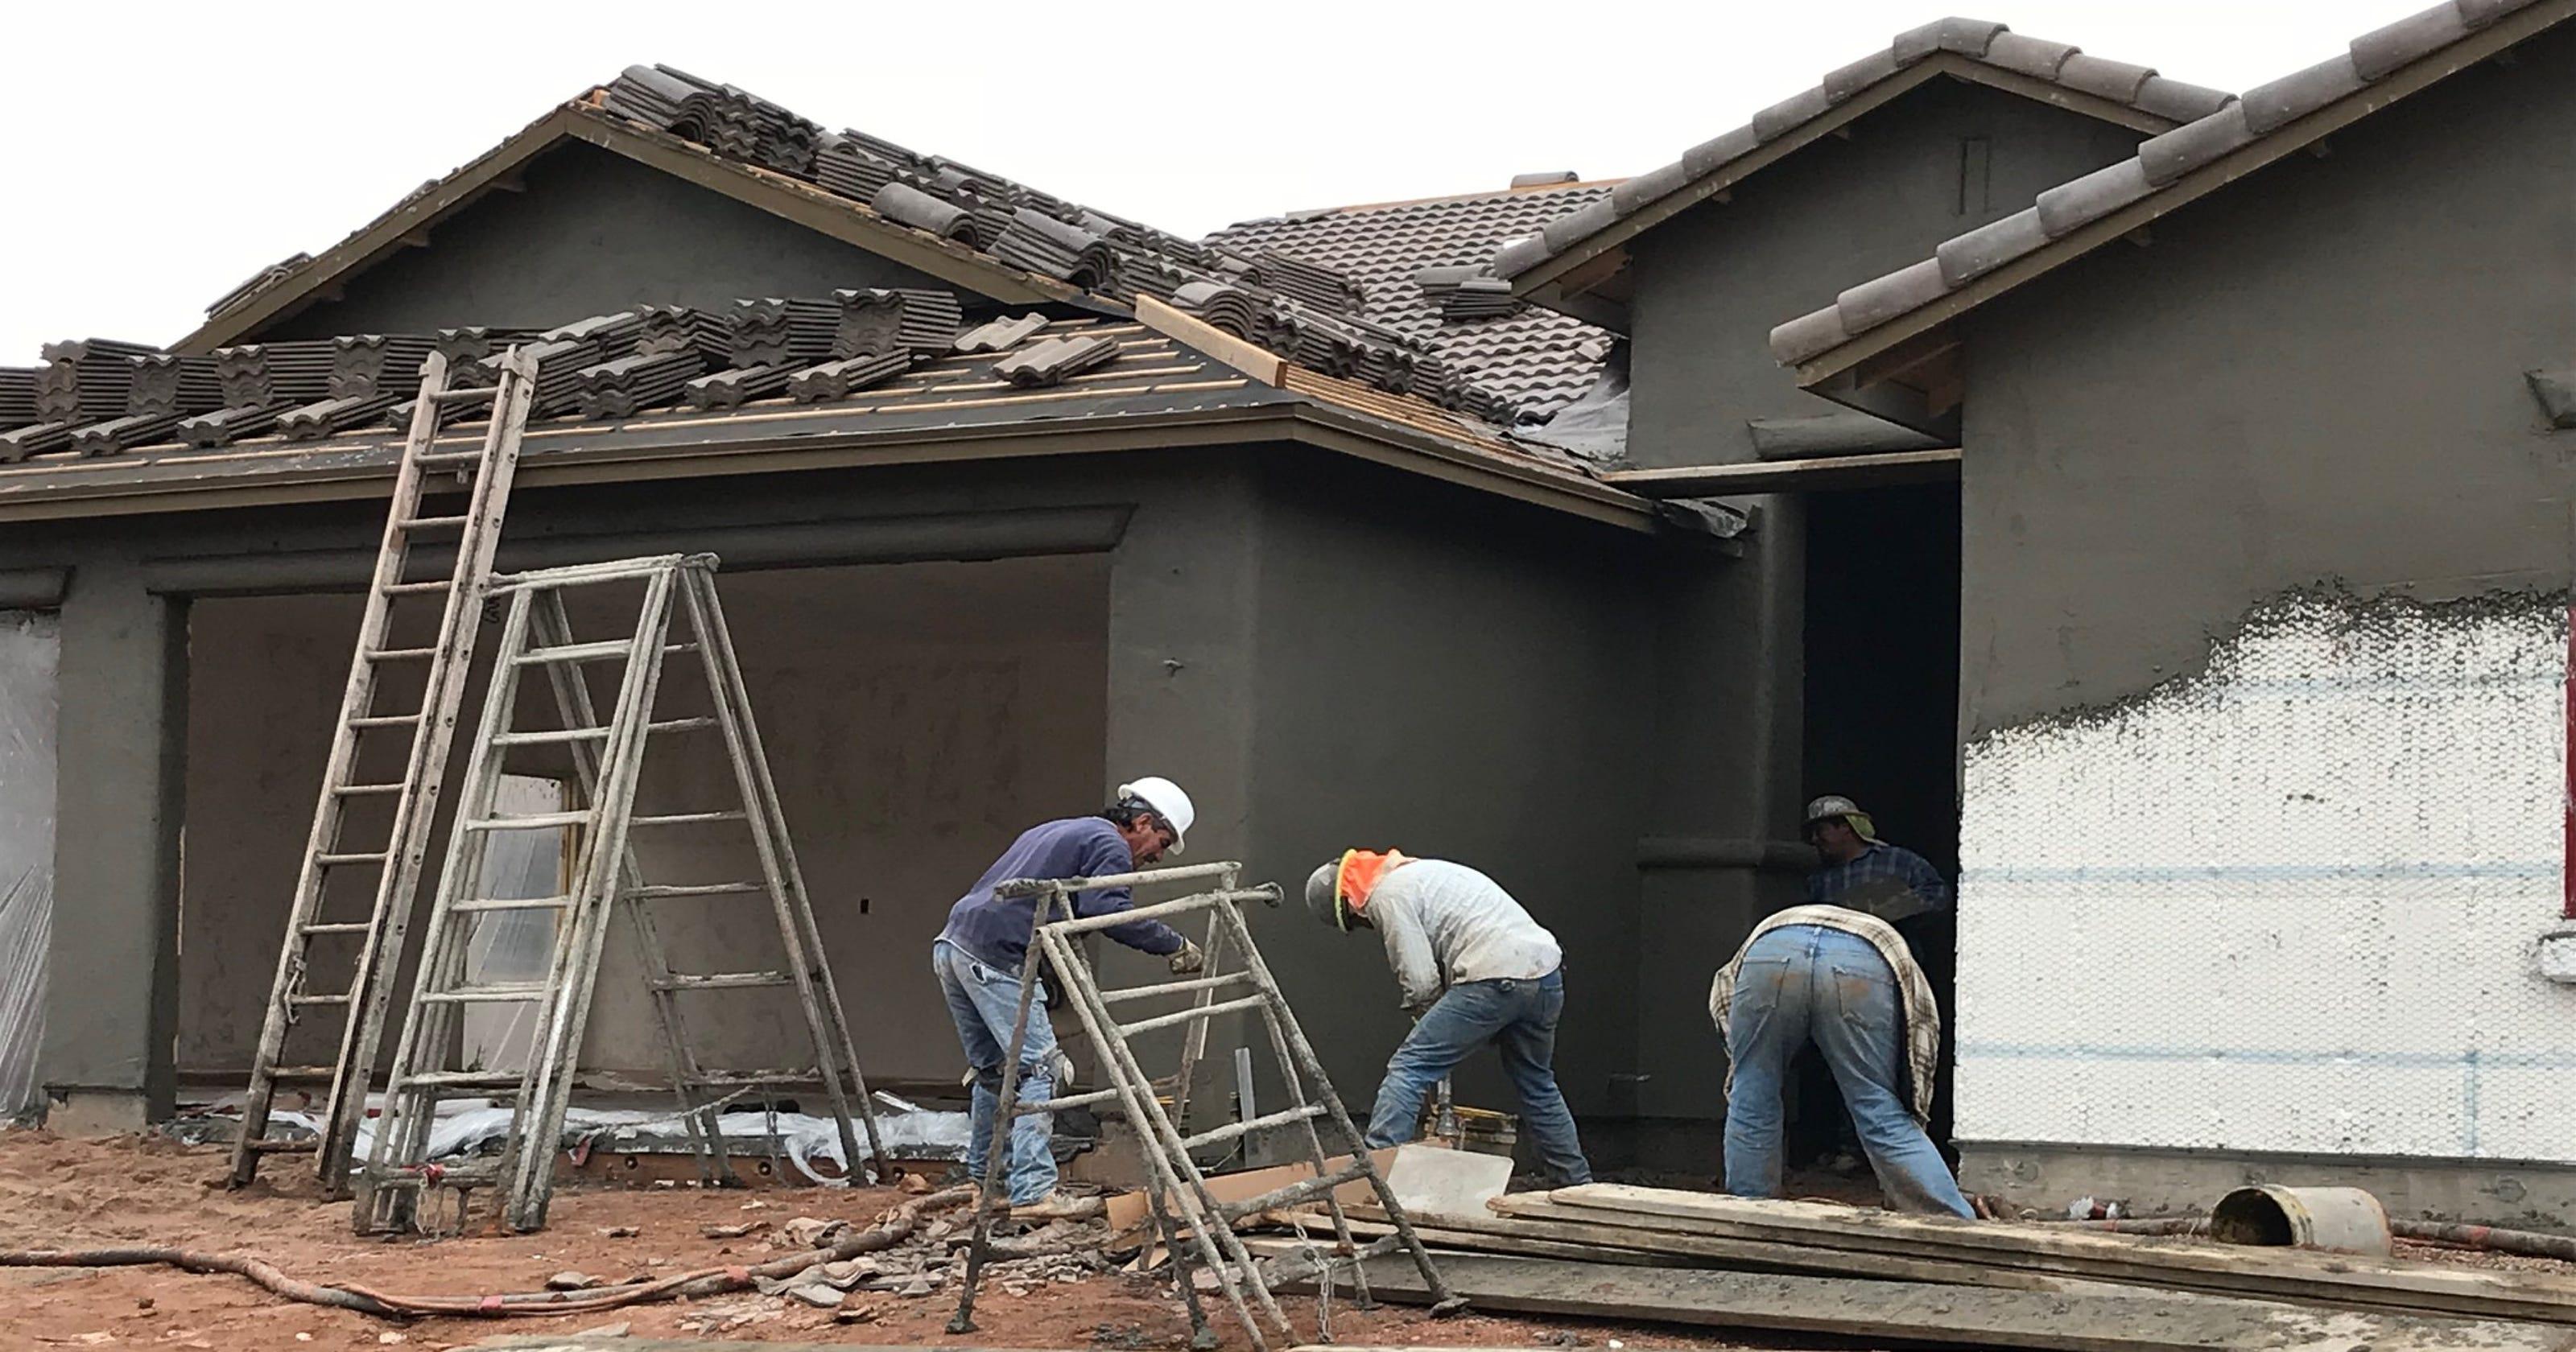 Arizona county turns to ex-inmates to fill construction labor shortage